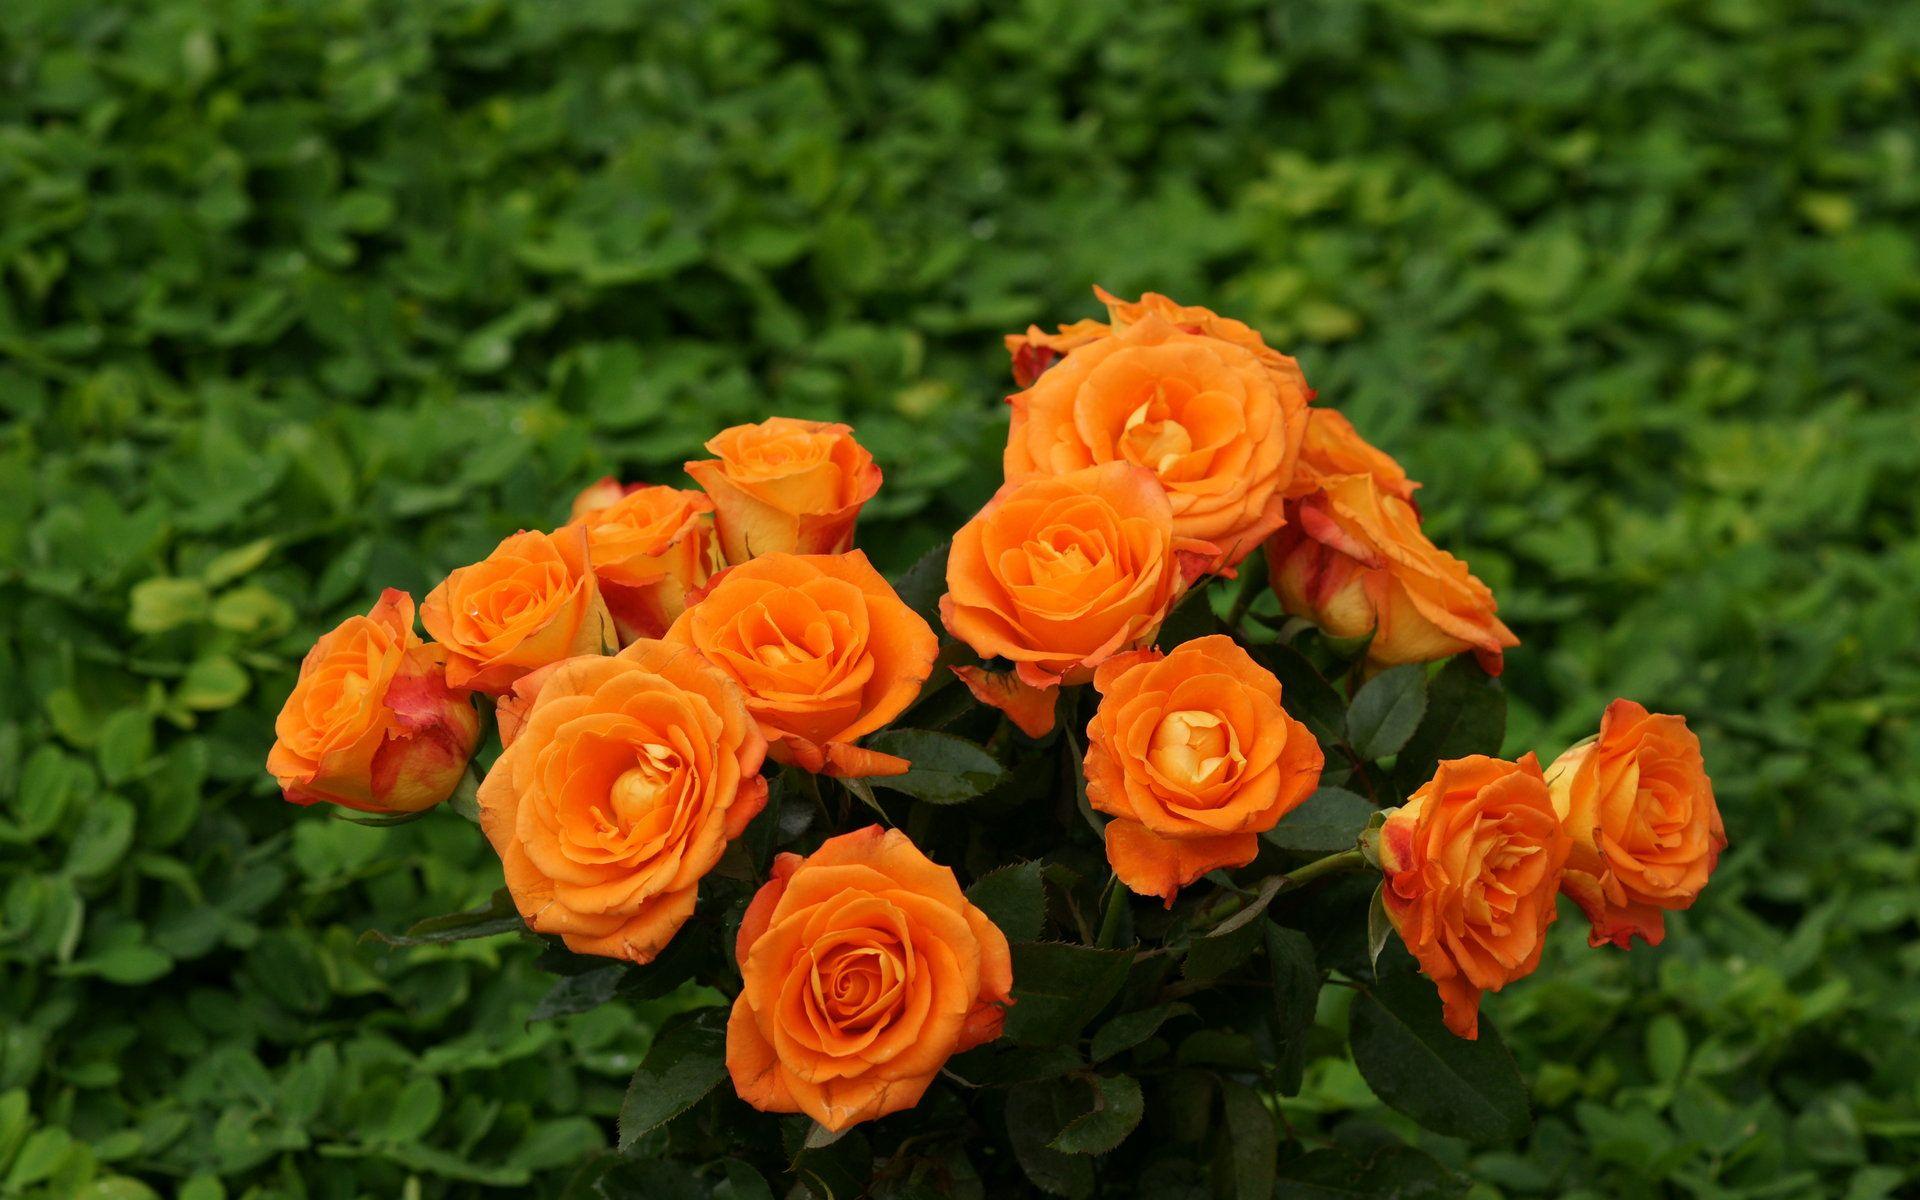 Orange Rose Pictures For Wallpaper orange roses